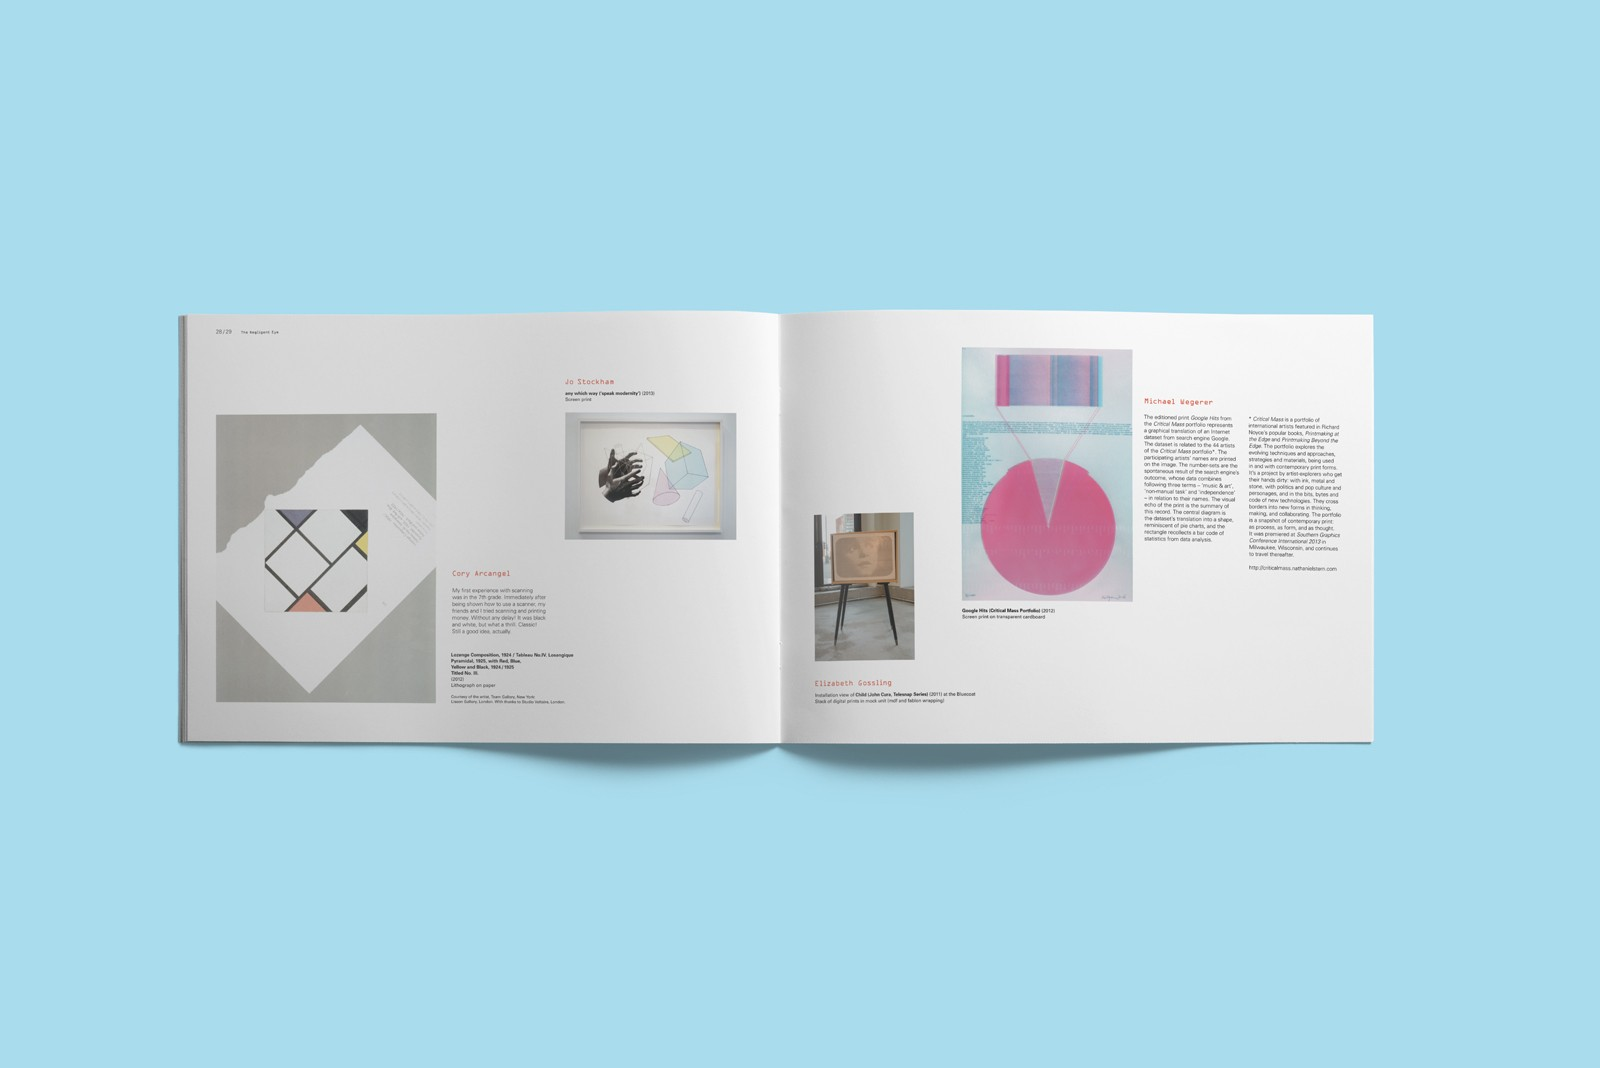 Exhibition publication: The Negligent Eye